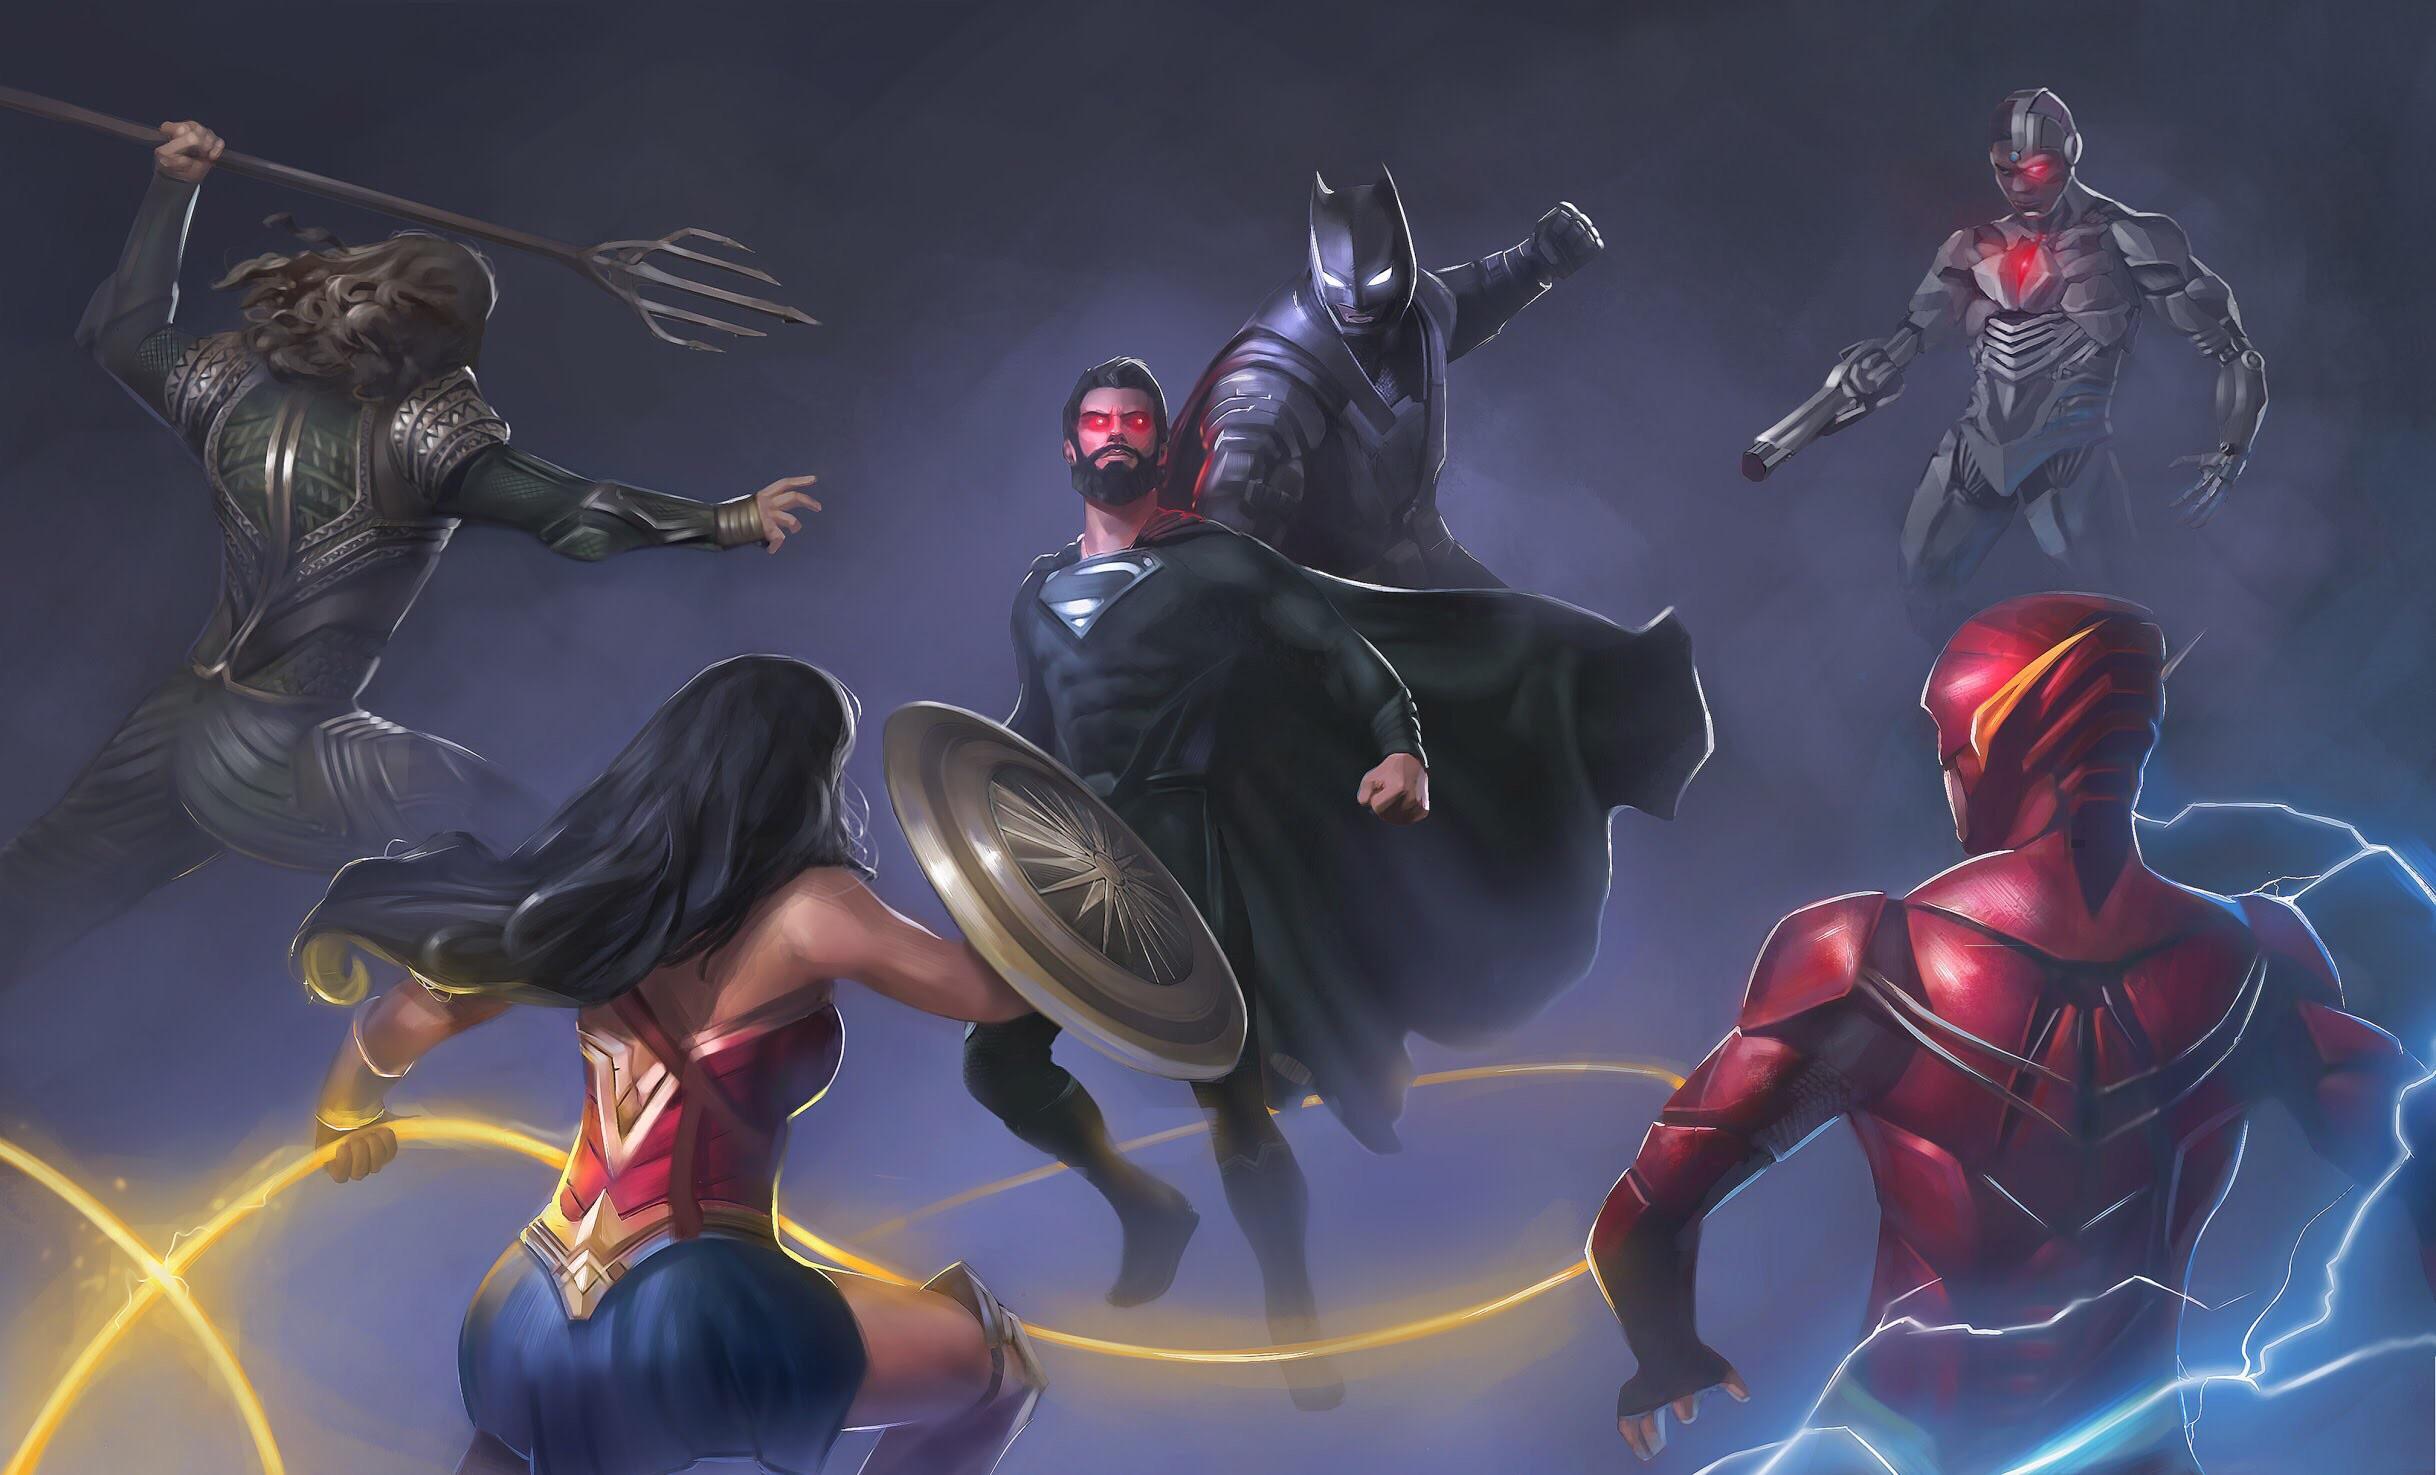 Wallpaper Justice League 2017 Movies Flash Superman: Superman Vs Justice League Artwork, HD Superheroes, 4k